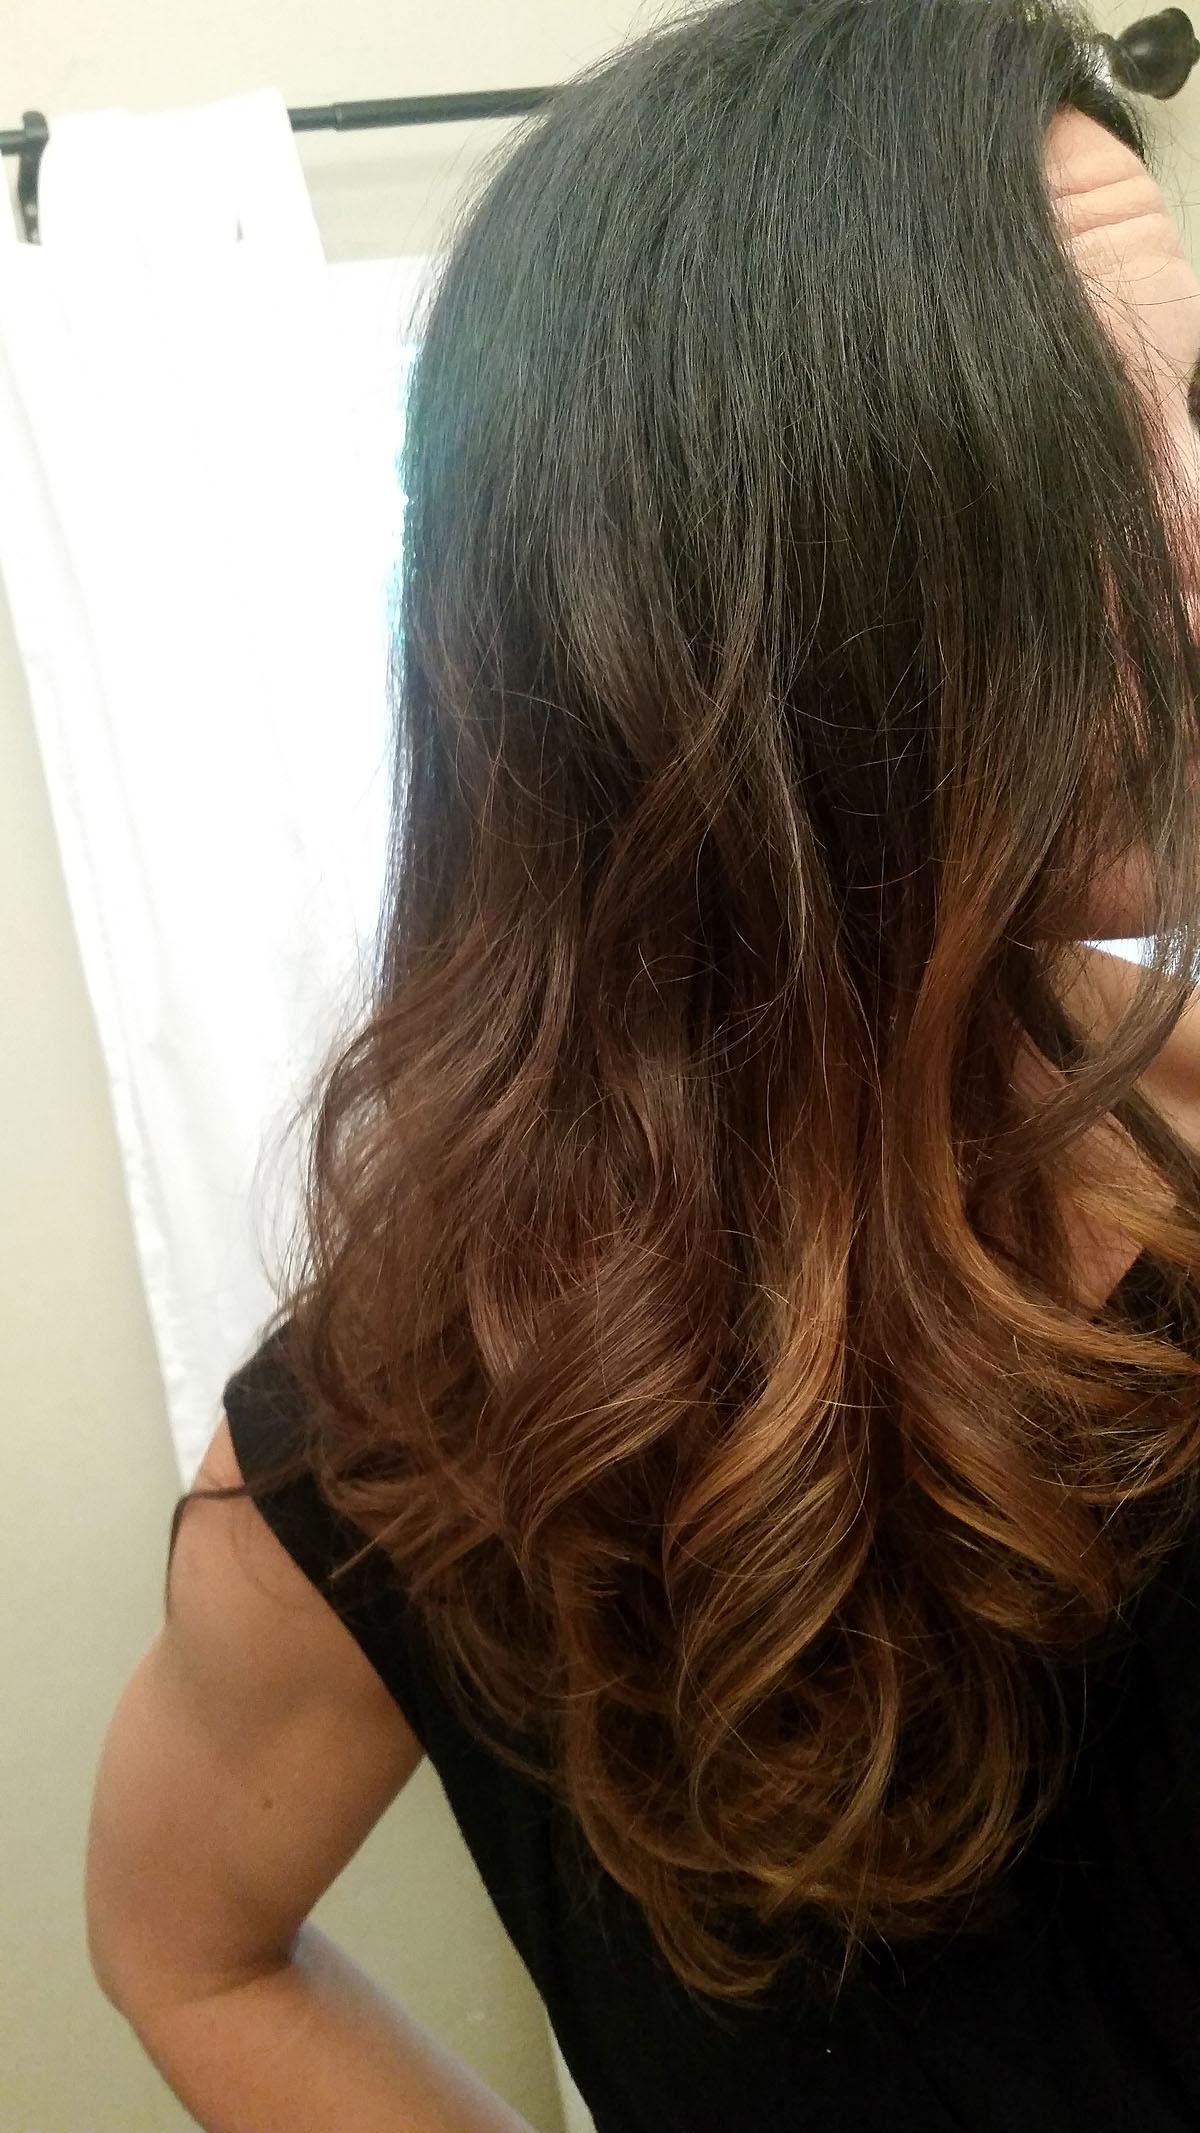 Long Ombre Hair - Black to Caramel